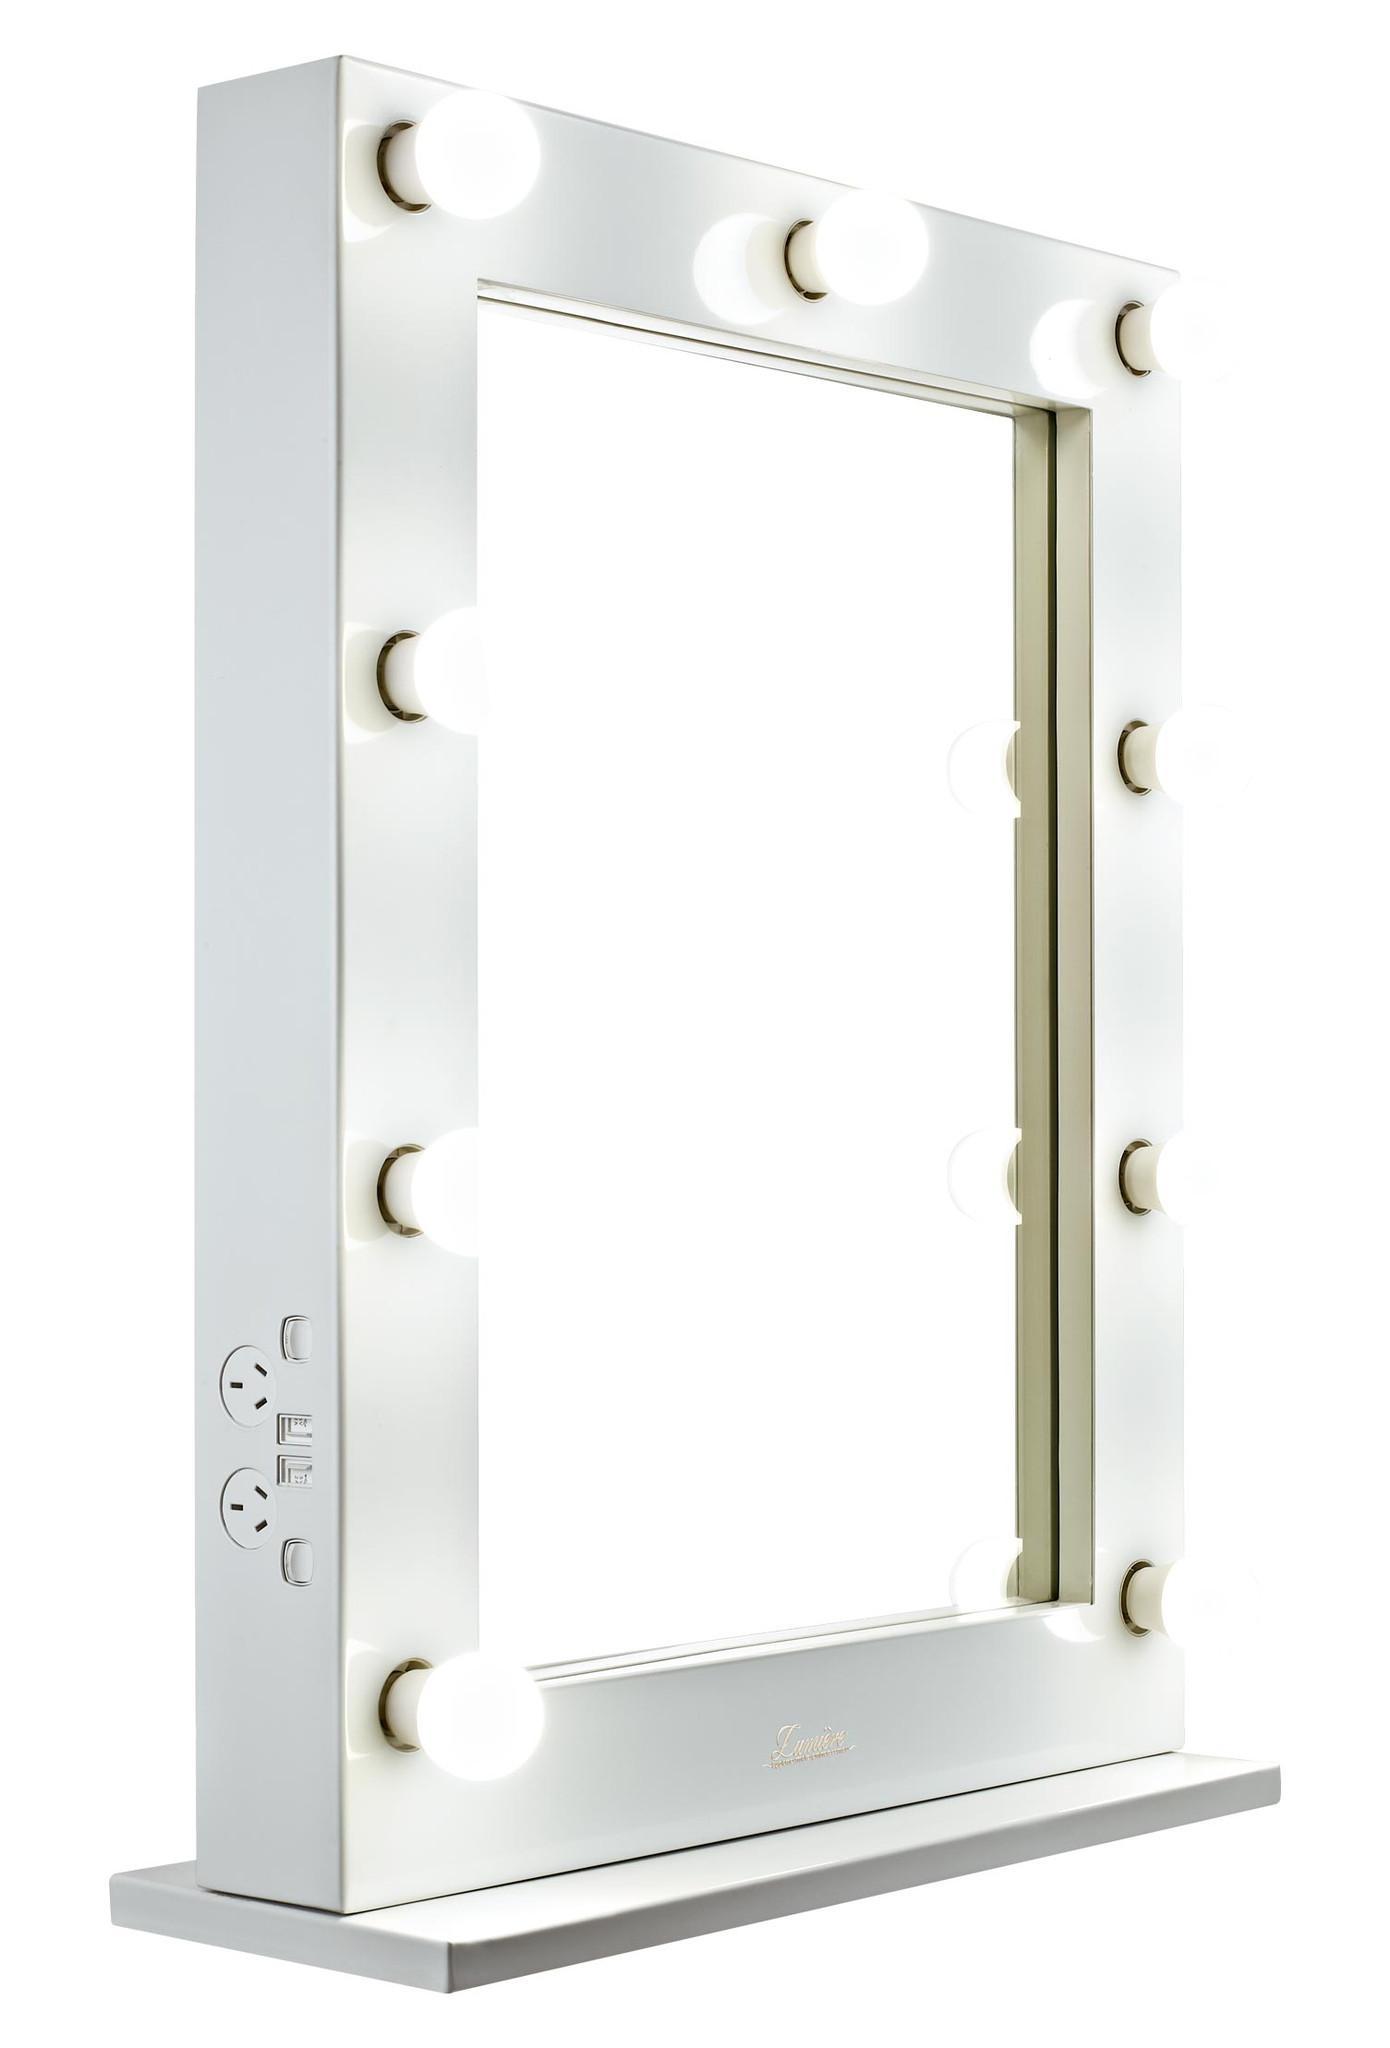 Bathroom: Lighted Makeup Mirror Vanity With Lighted Mirror Vanity Within Lit Makeup Mirrors (View 16 of 20)